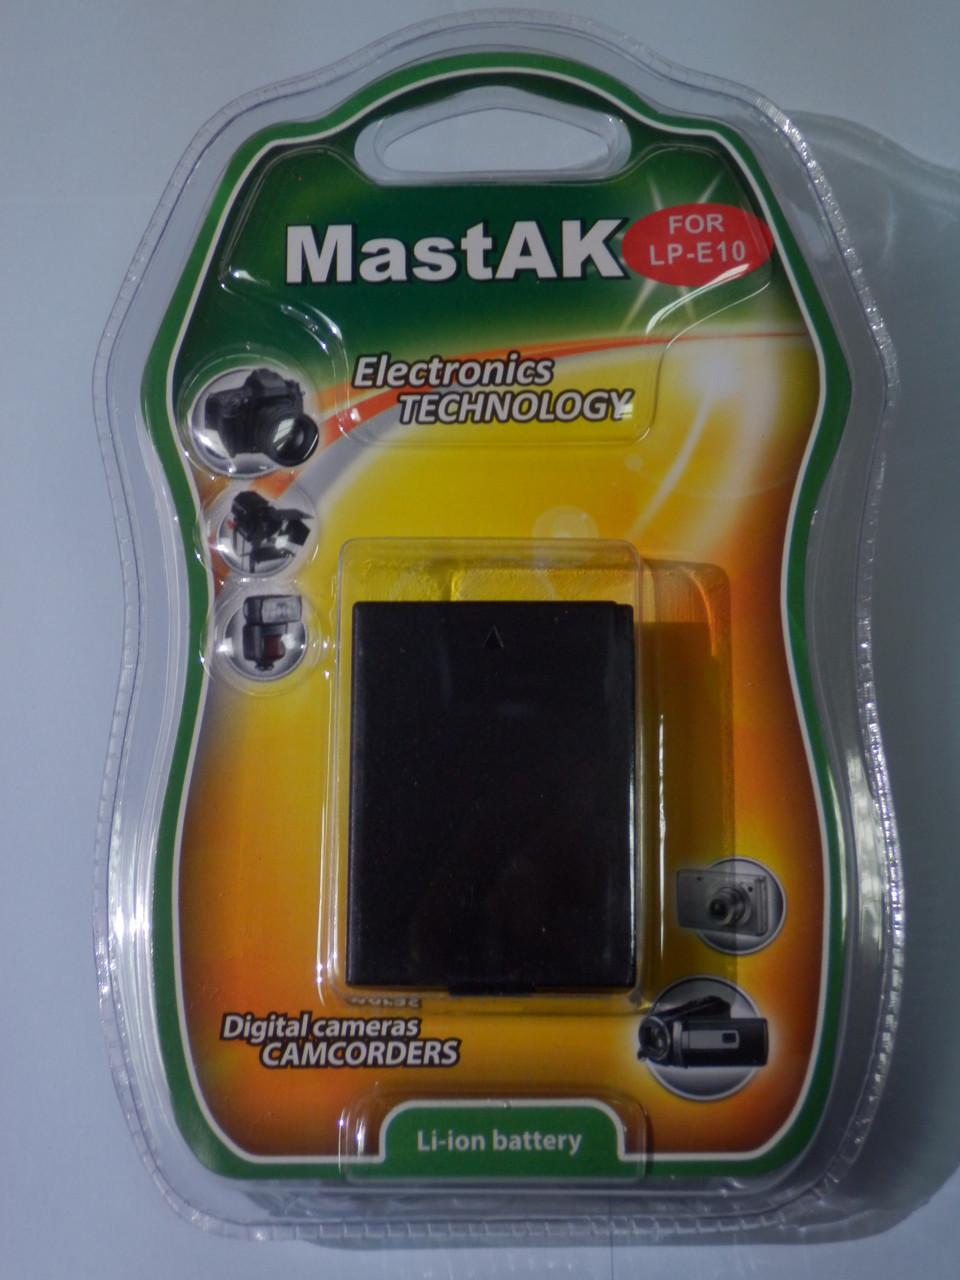 Аккумулятор Mastak аналог Canon LP-E10